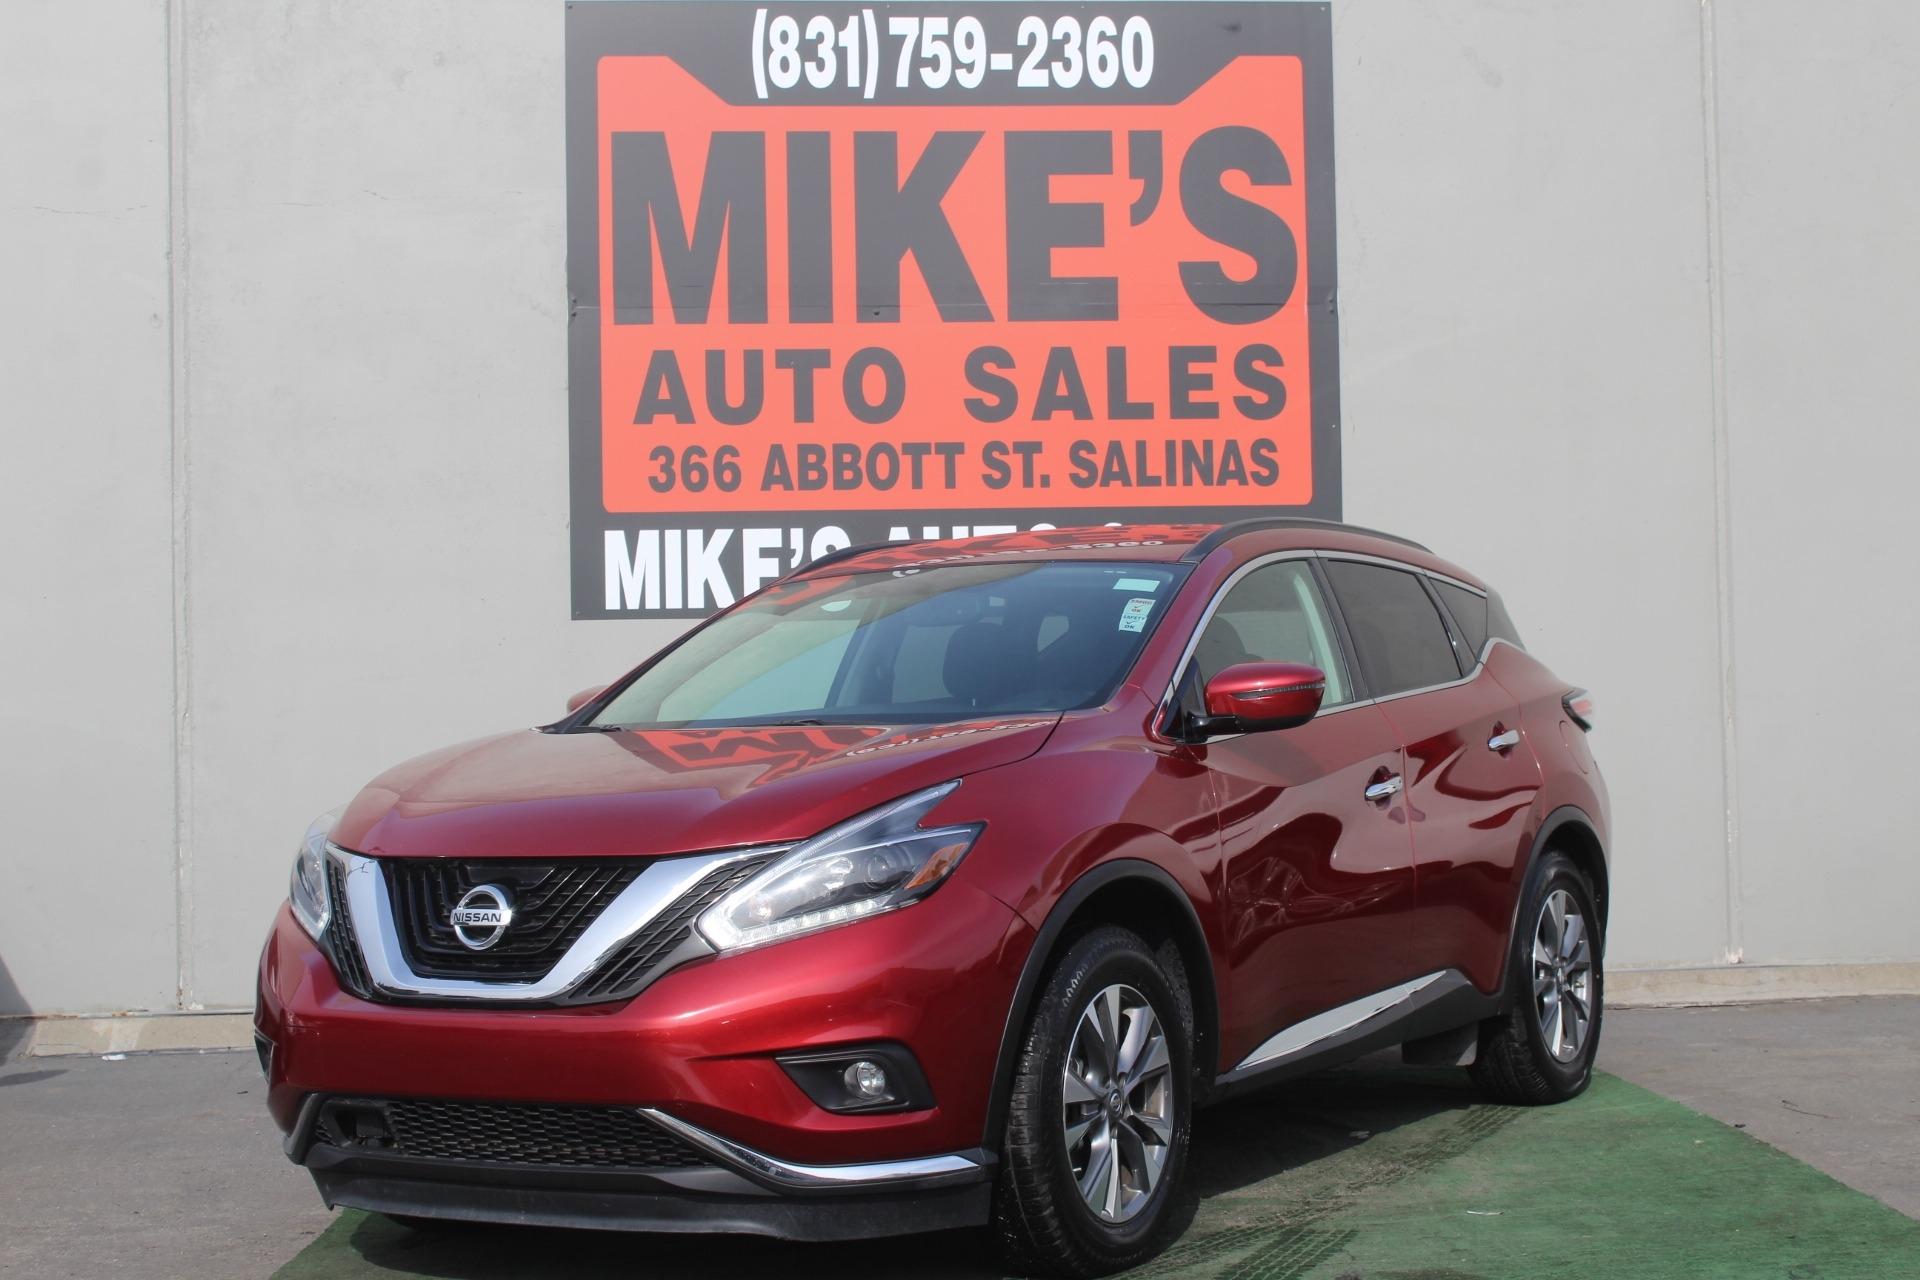 2018 Nissan Murano FWD S in Salinas, CA